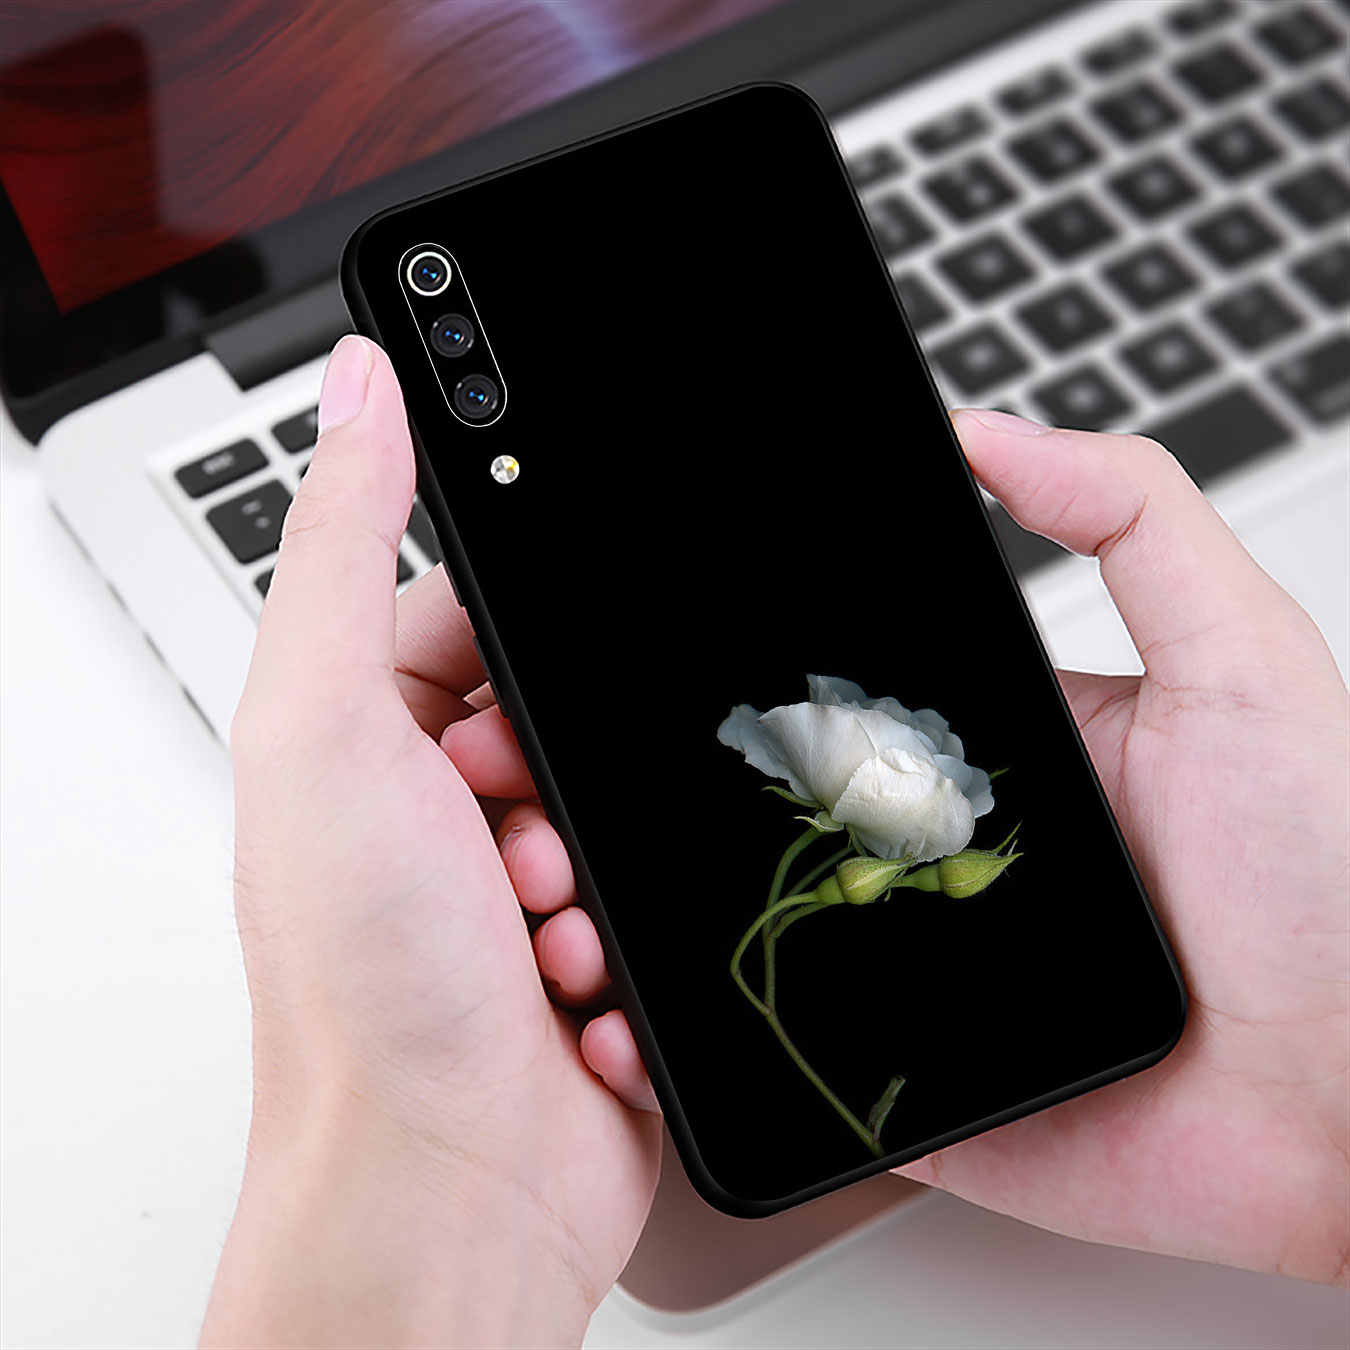 Funda suave flor amarilla tono oscuro para Xiaomi mi 10 9T A3 Pro 8 SE A2 Lite A1 6 CC9 CC9E pocofone f1 mi 10